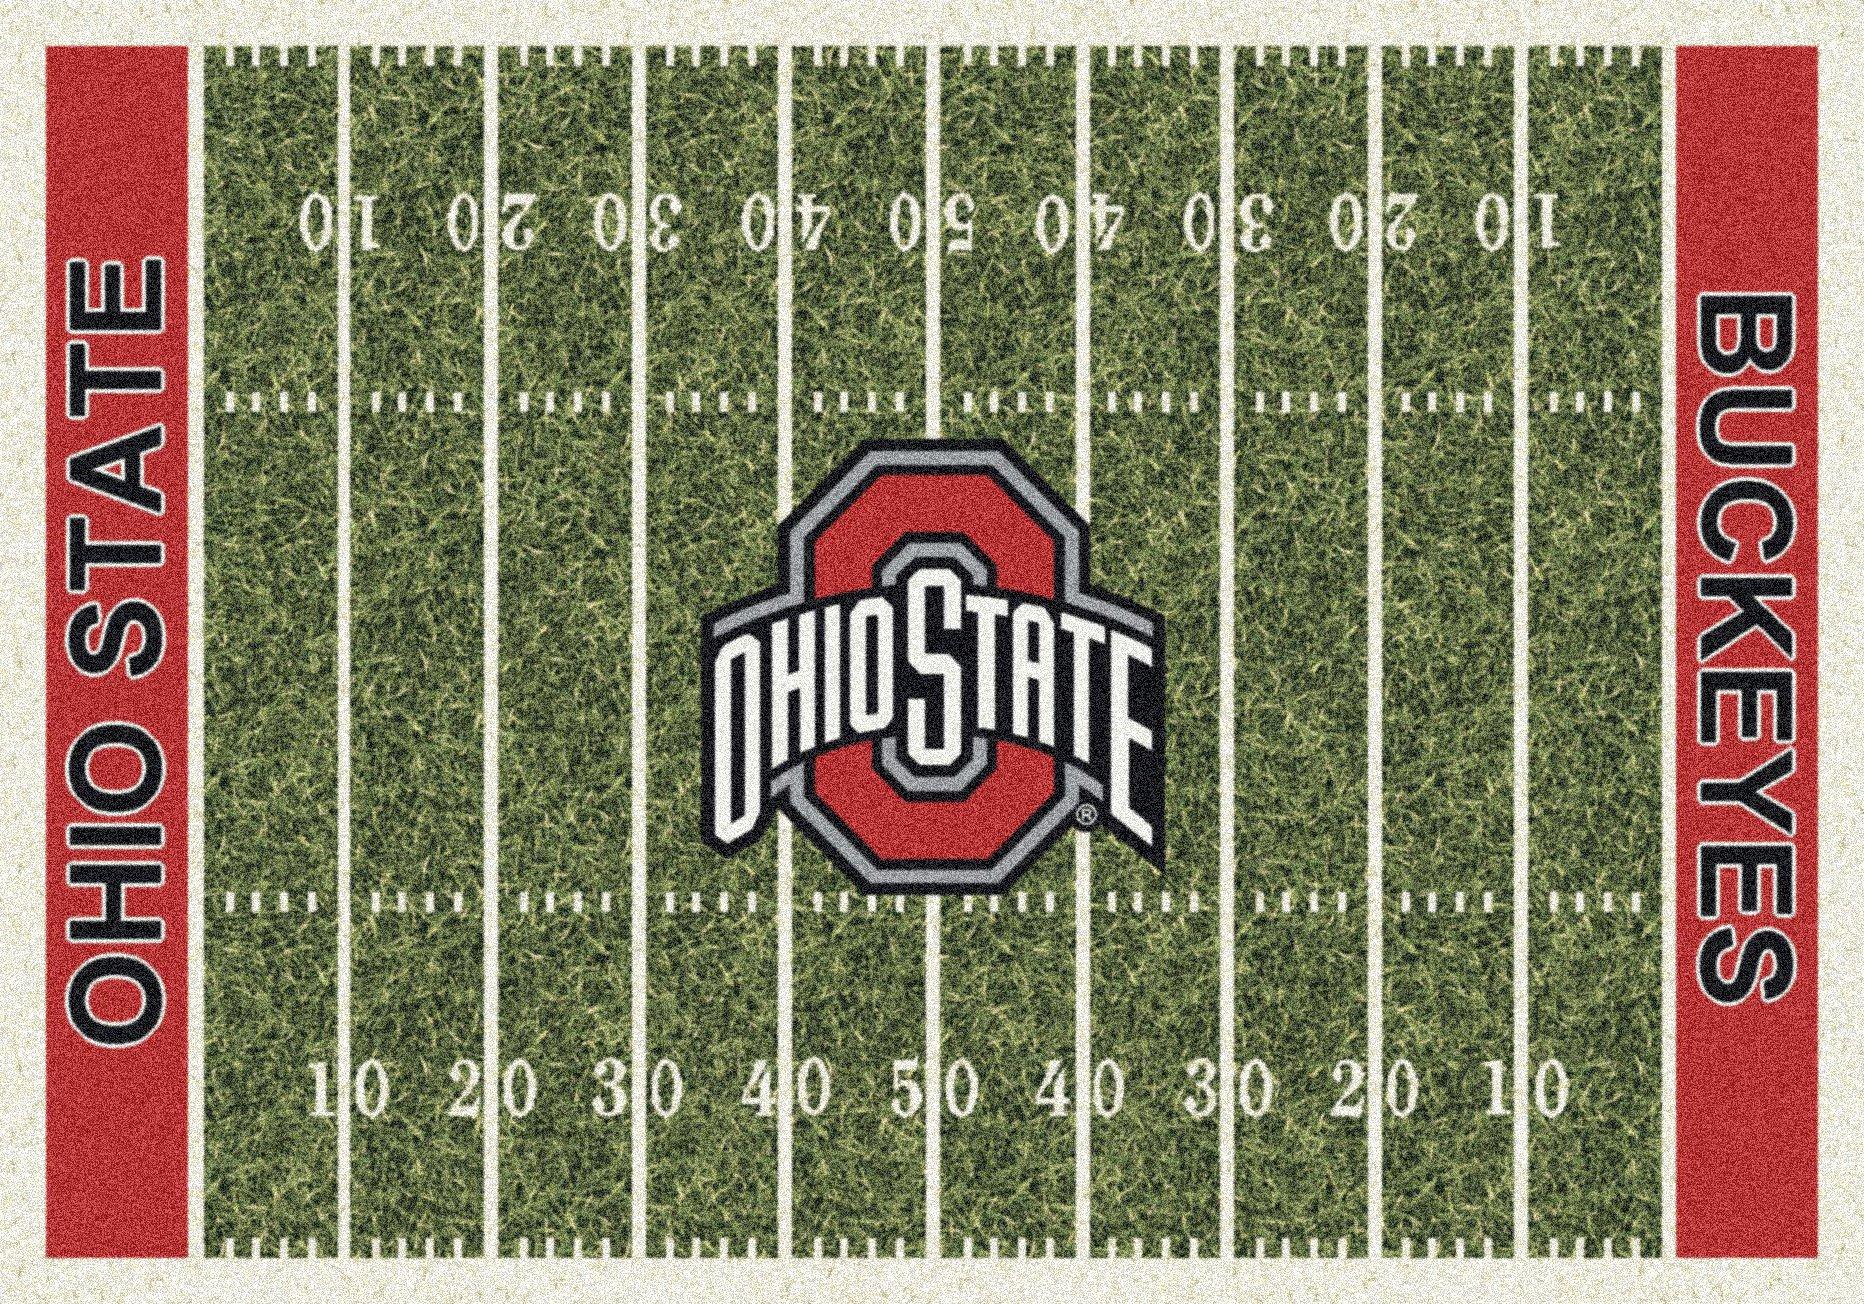 Ohio State Buckeyes NCAA College Home Field Team Area Rug 7'8''x10'9''